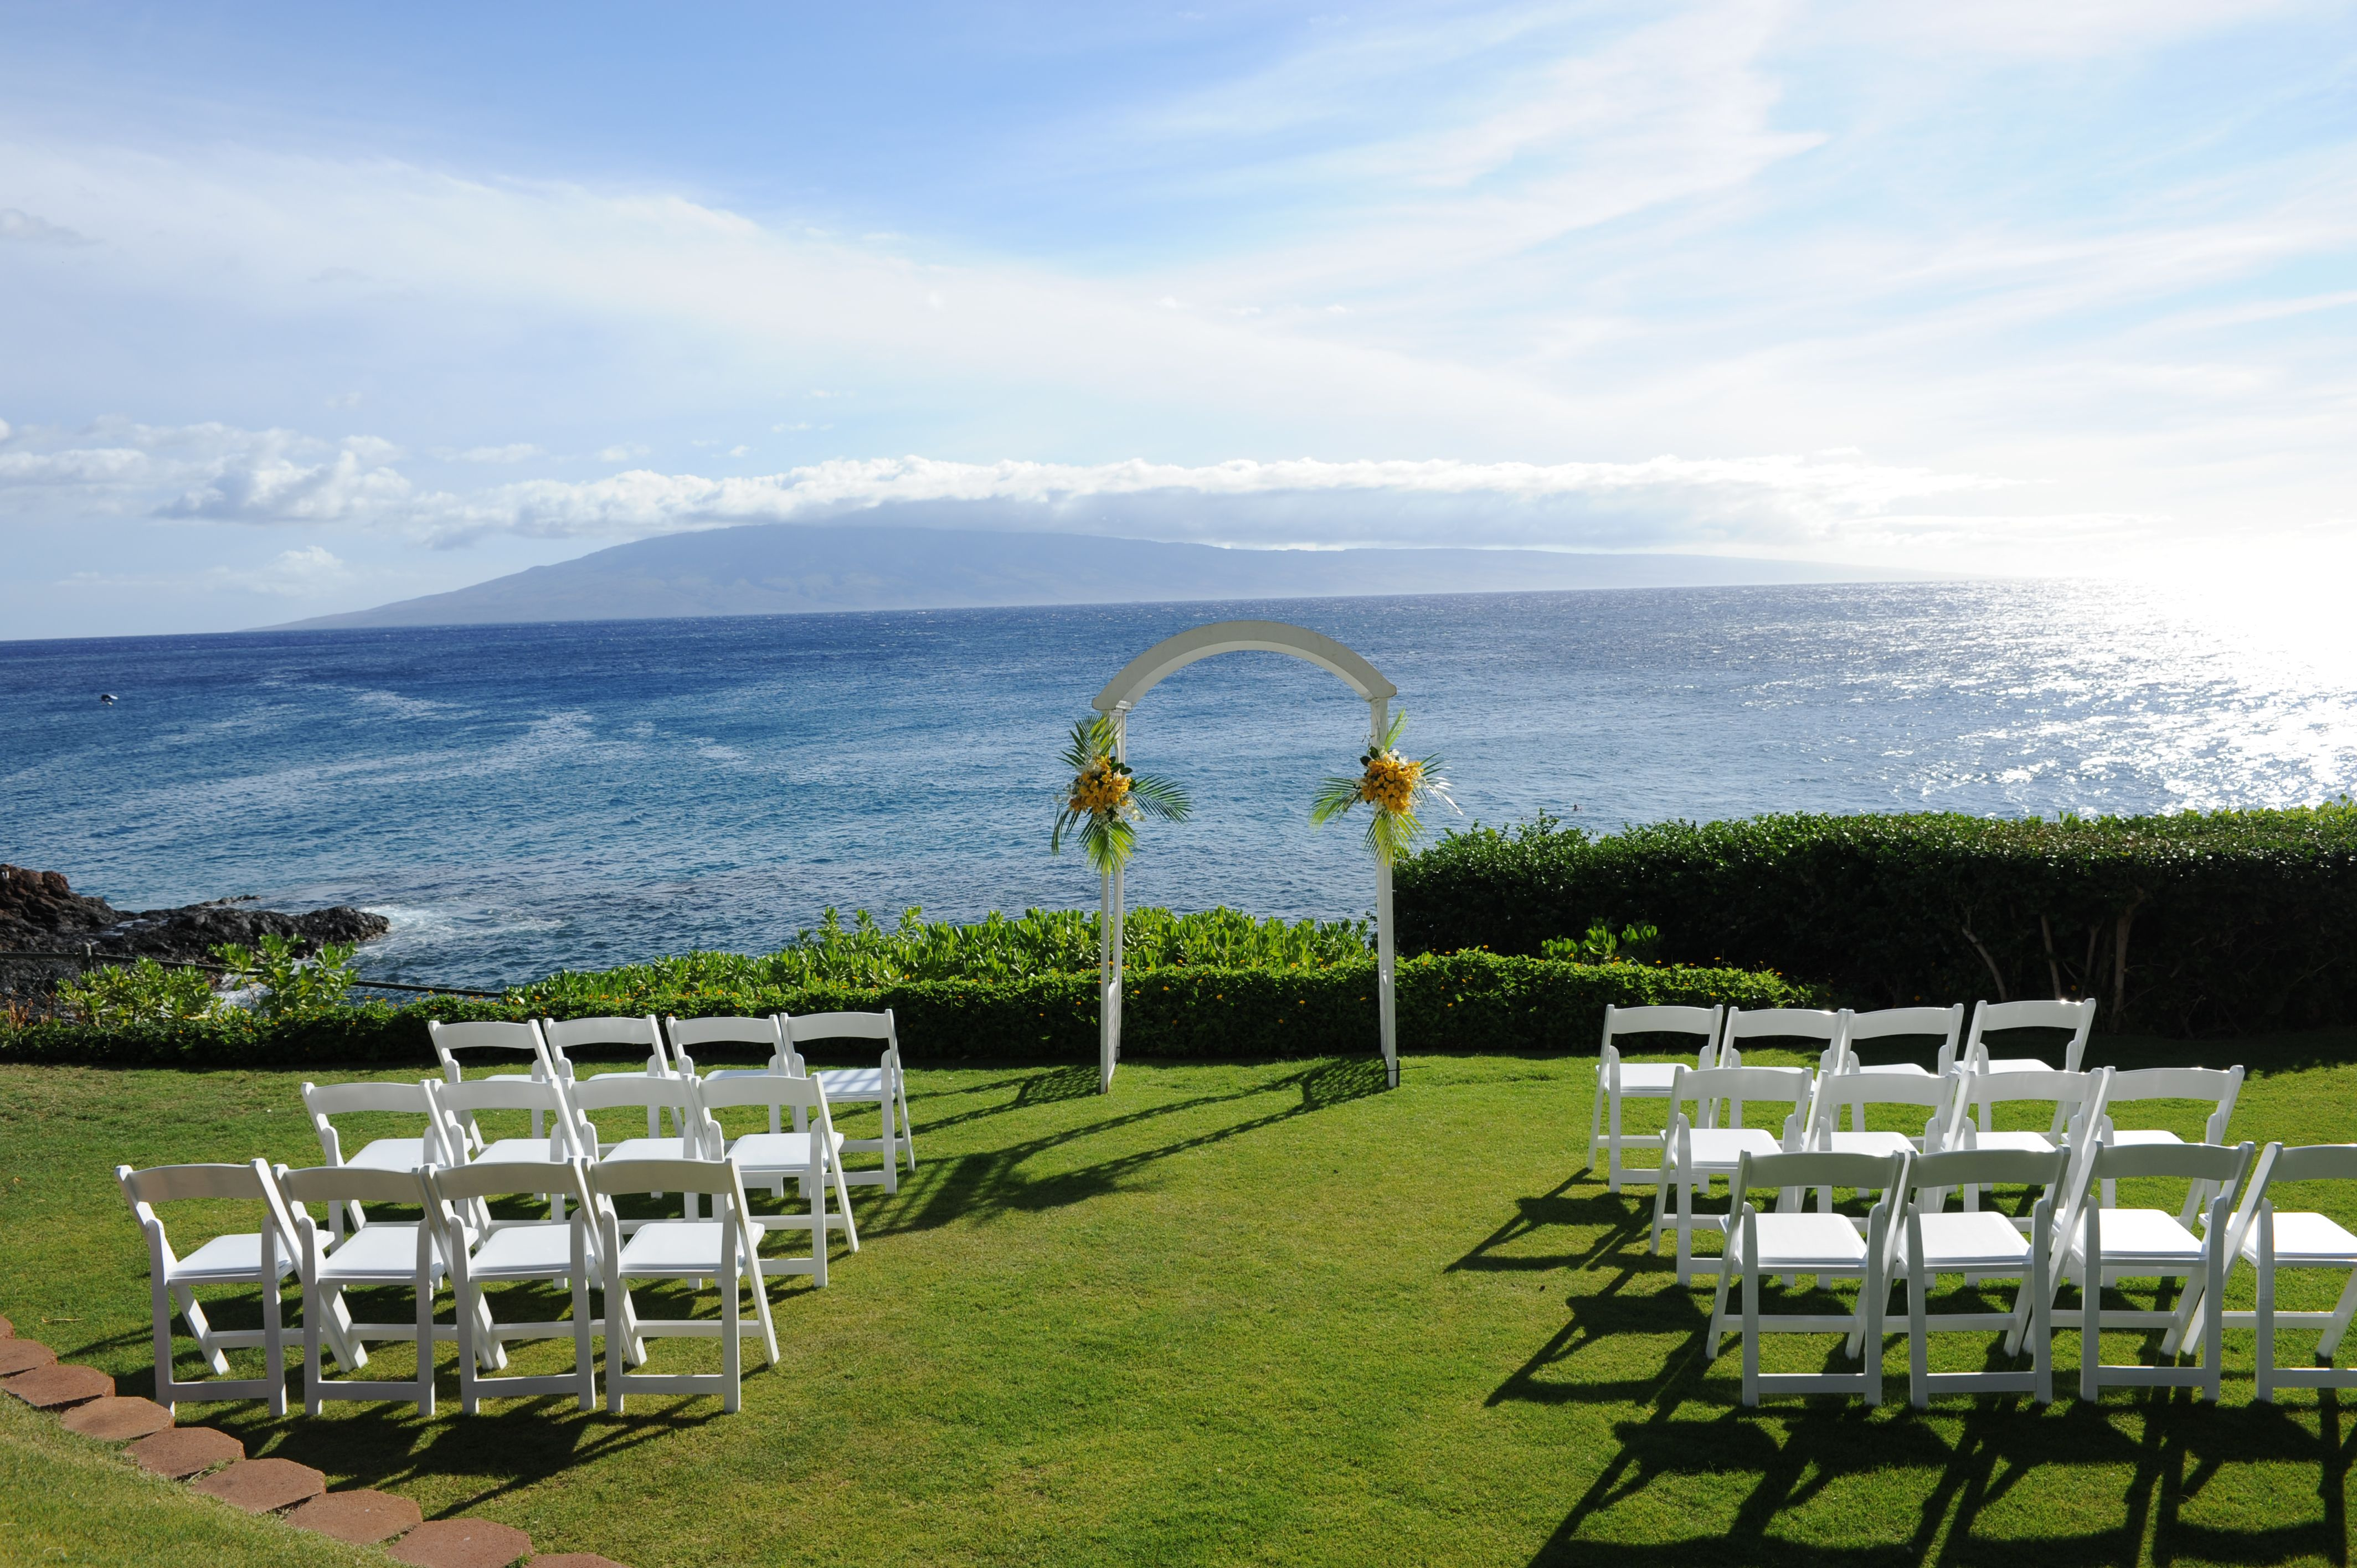 Destination Wedding On a Budget Maui destination wedding